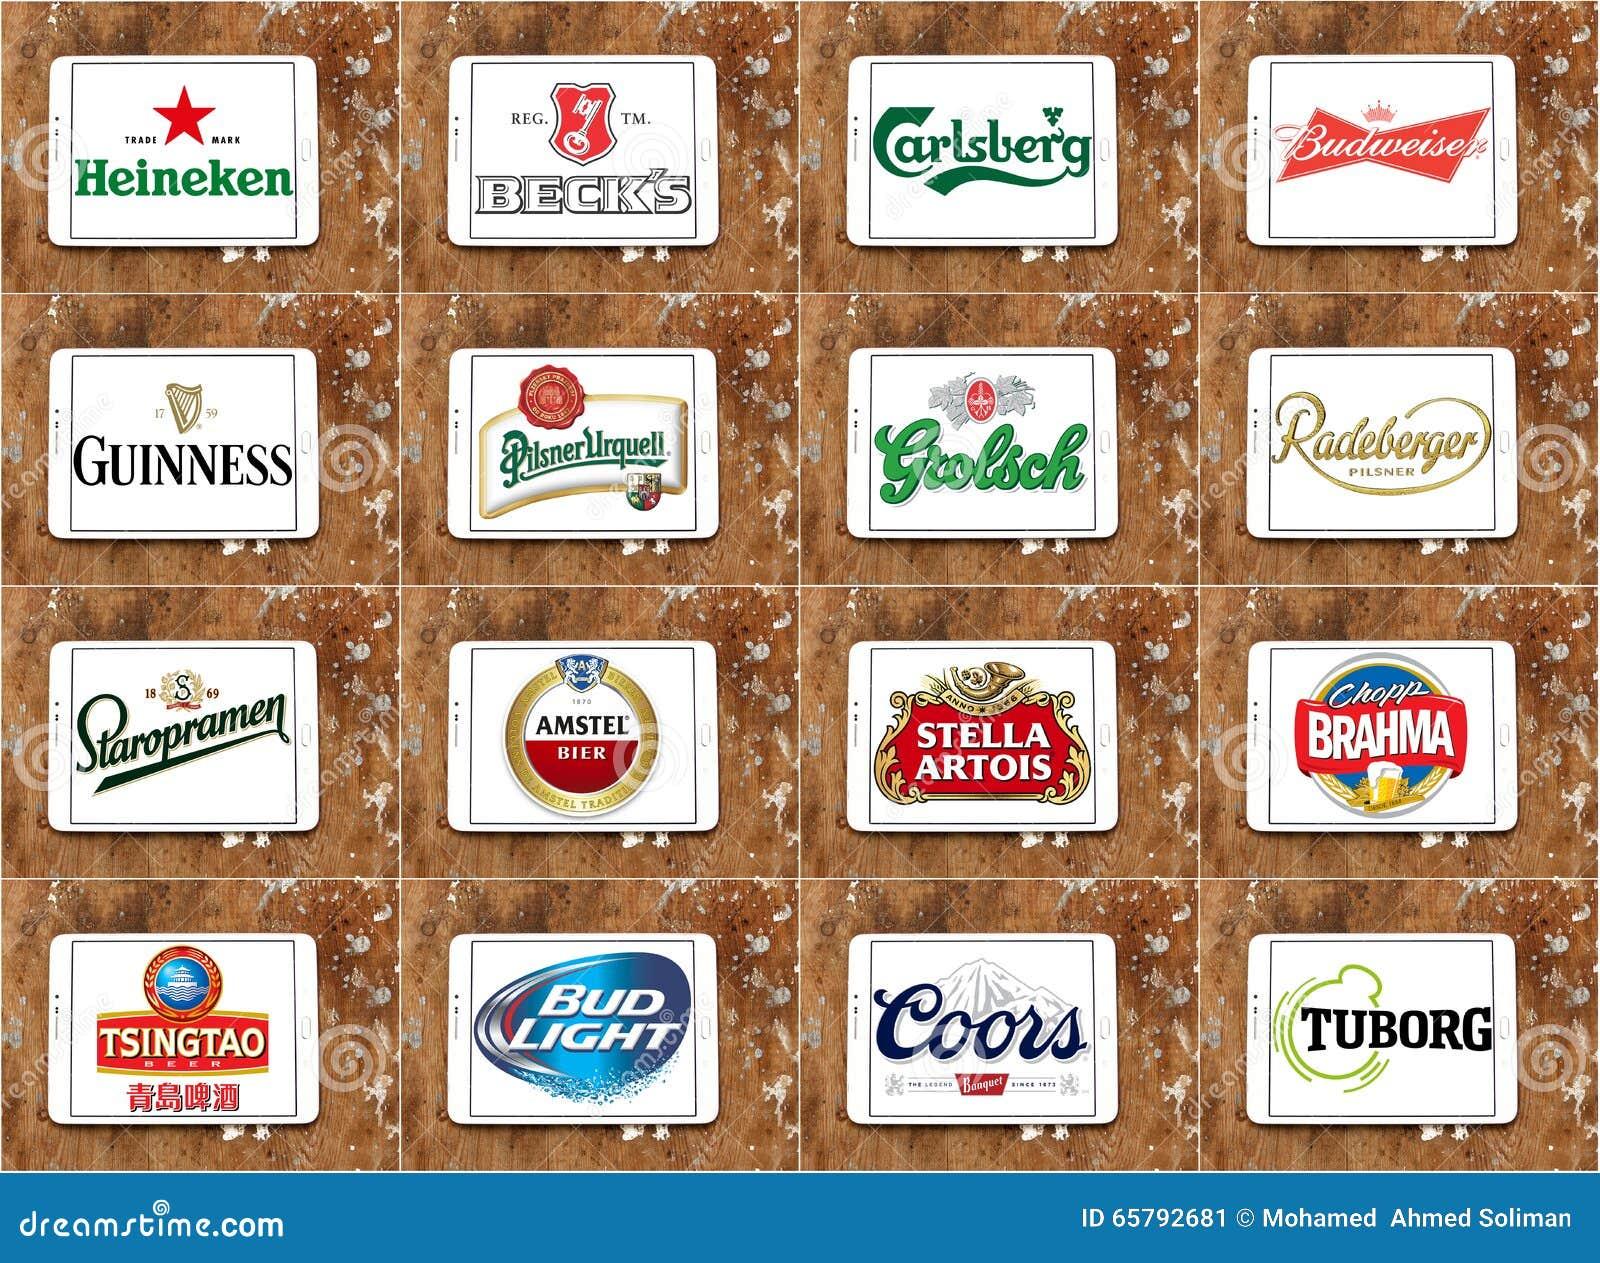 Soft drink business plan